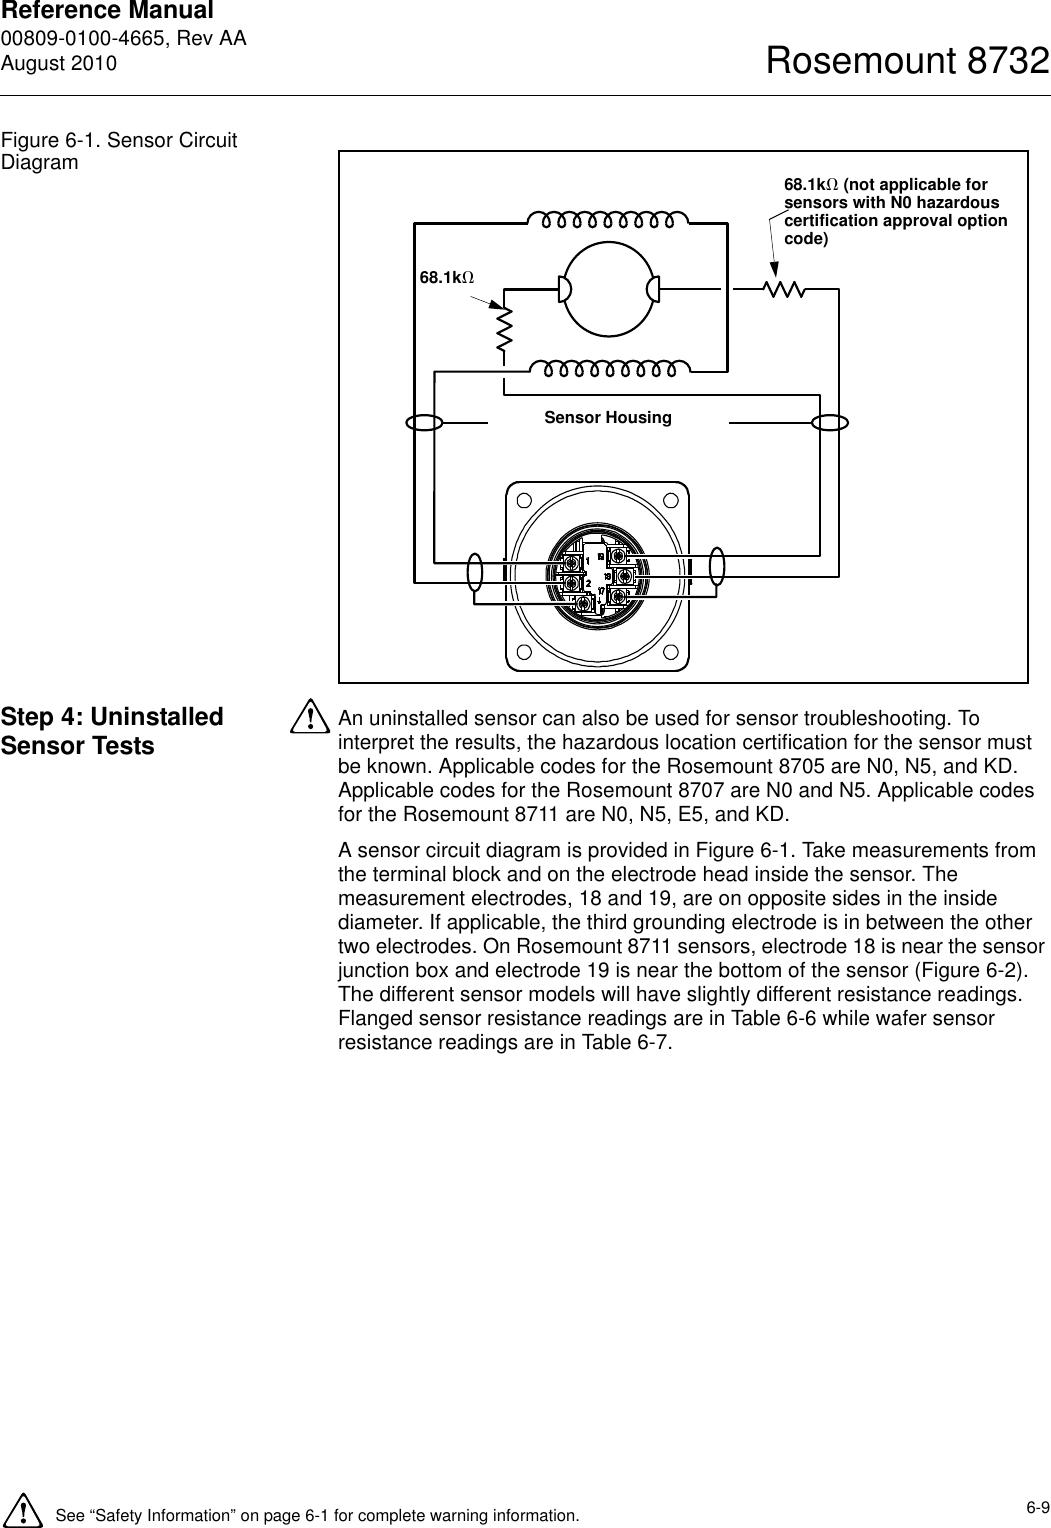 Terrific Barrett Wiring Diagram Wiring Library Wiring Cloud Hisonuggs Outletorg